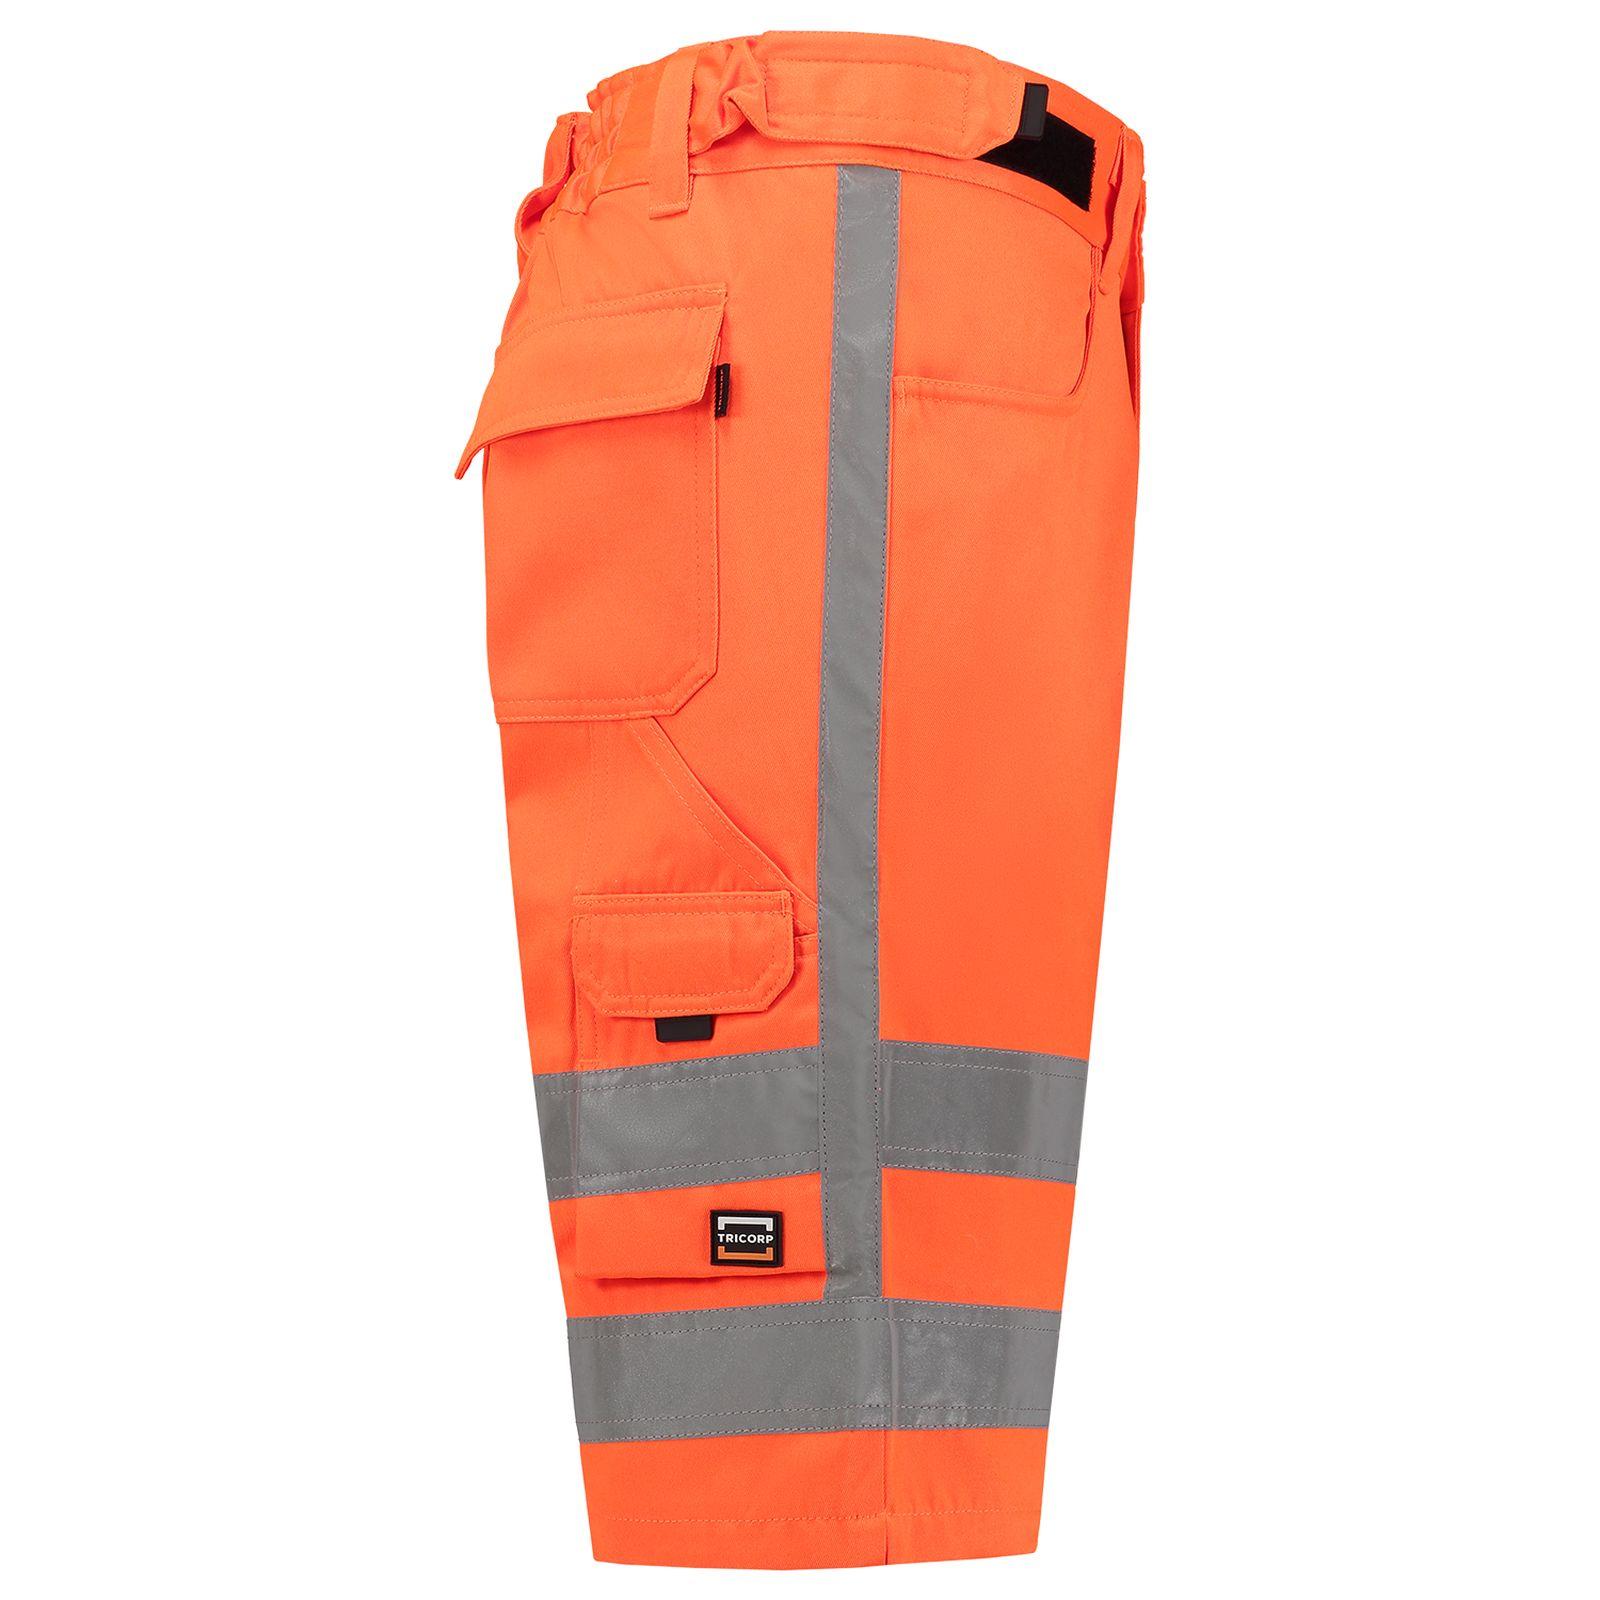 Tricorp Broeken 503006 High Vis- RWS fluo-oranje(Orange)